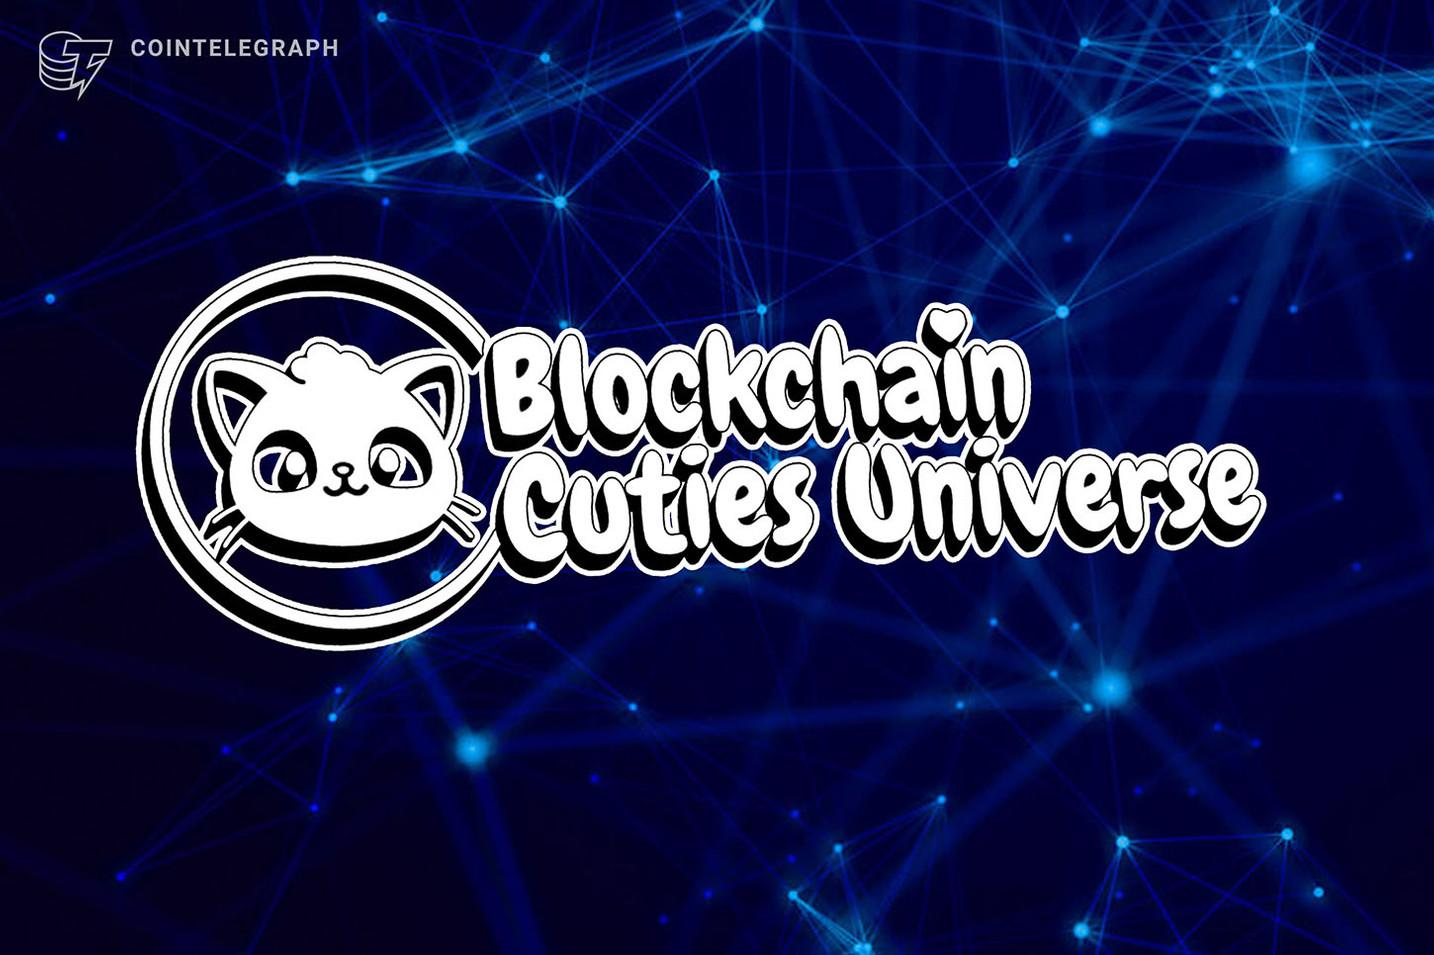 Blockchain Cuties Universe to launch DeFi and NFT tokenomics